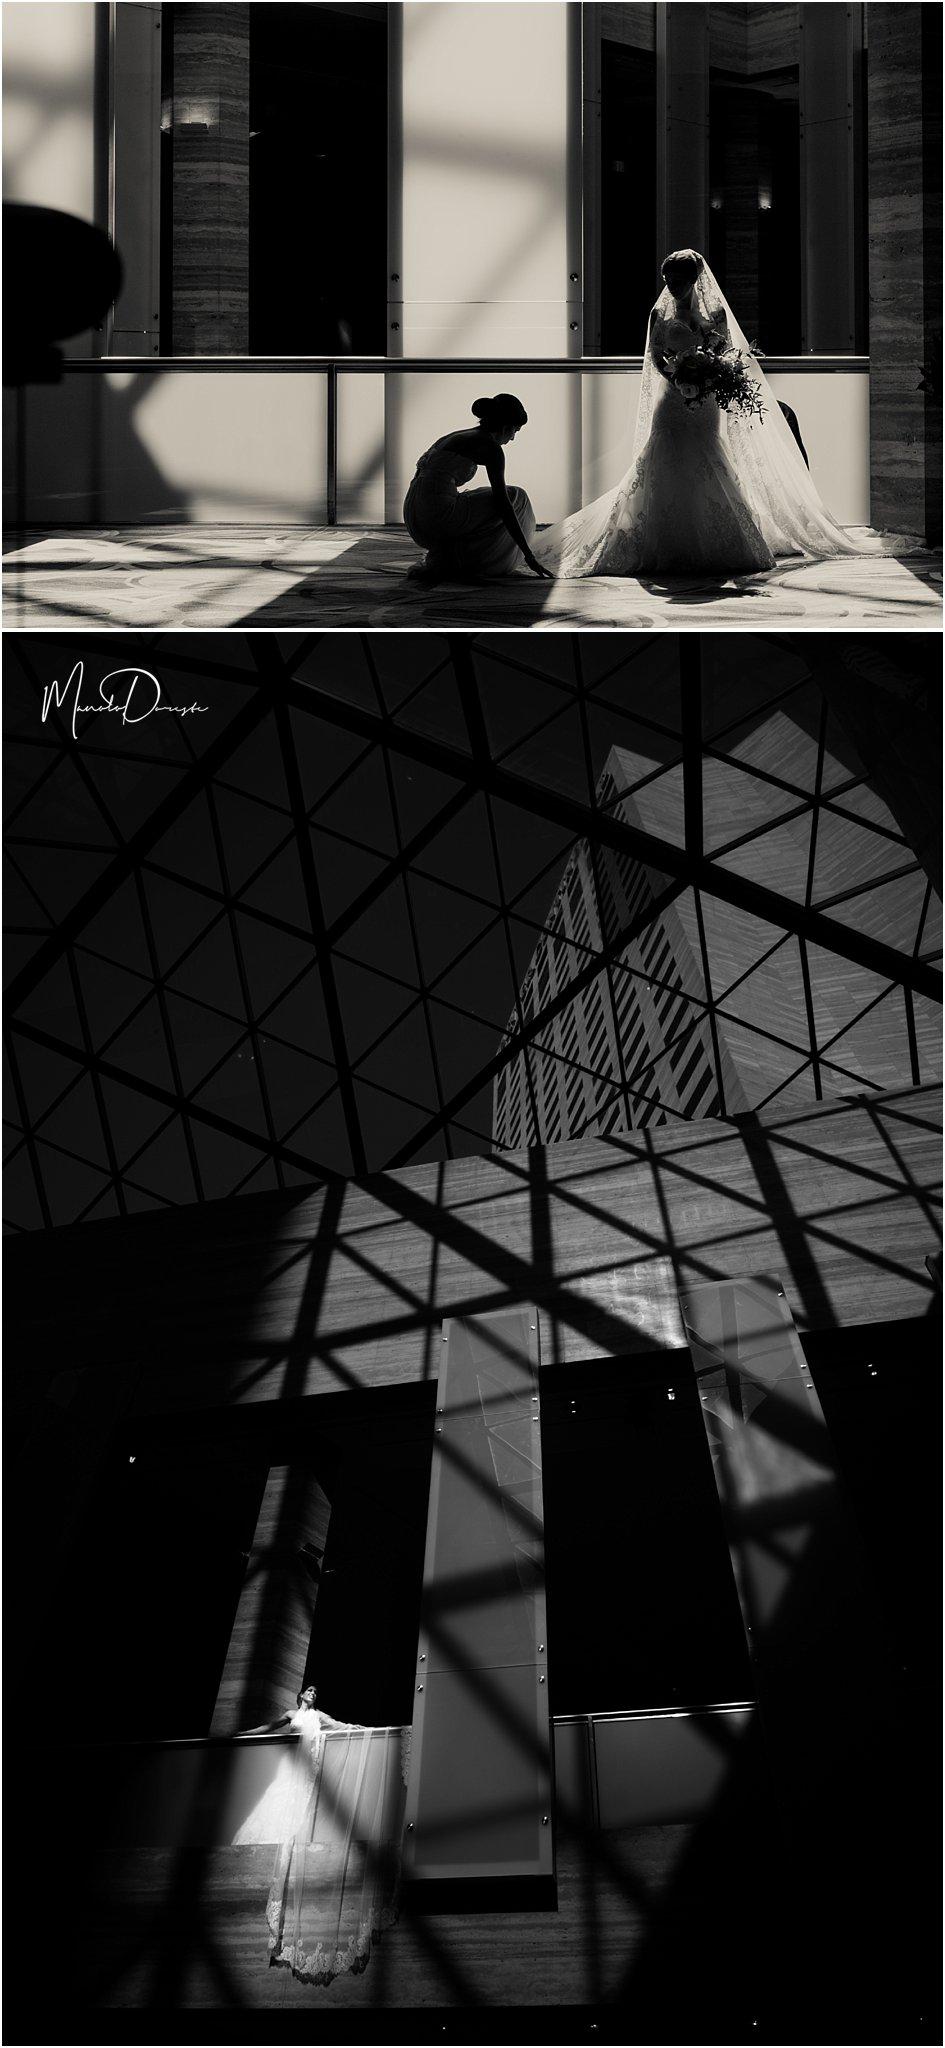 00750_ManoloDoreste_InFocusStudios_Wedding_Family_Photography_Miami_MiamiPhotographer.jpg